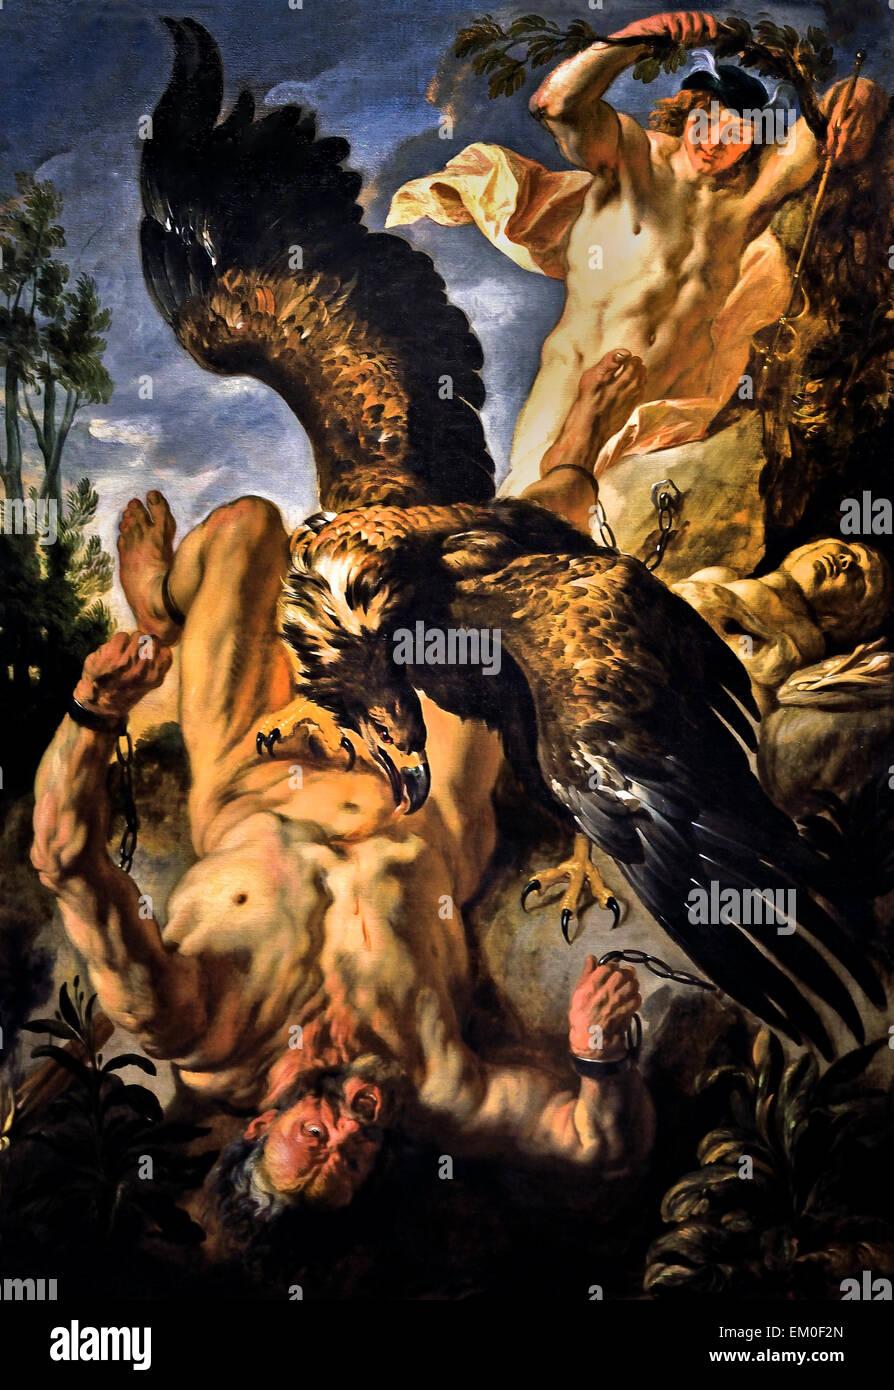 Jacob Jordaens (Antwerp 1593 – 1678 Antwerp)  Prometheus Bound 1642 Flemish Belgian Belgium - Stock Image